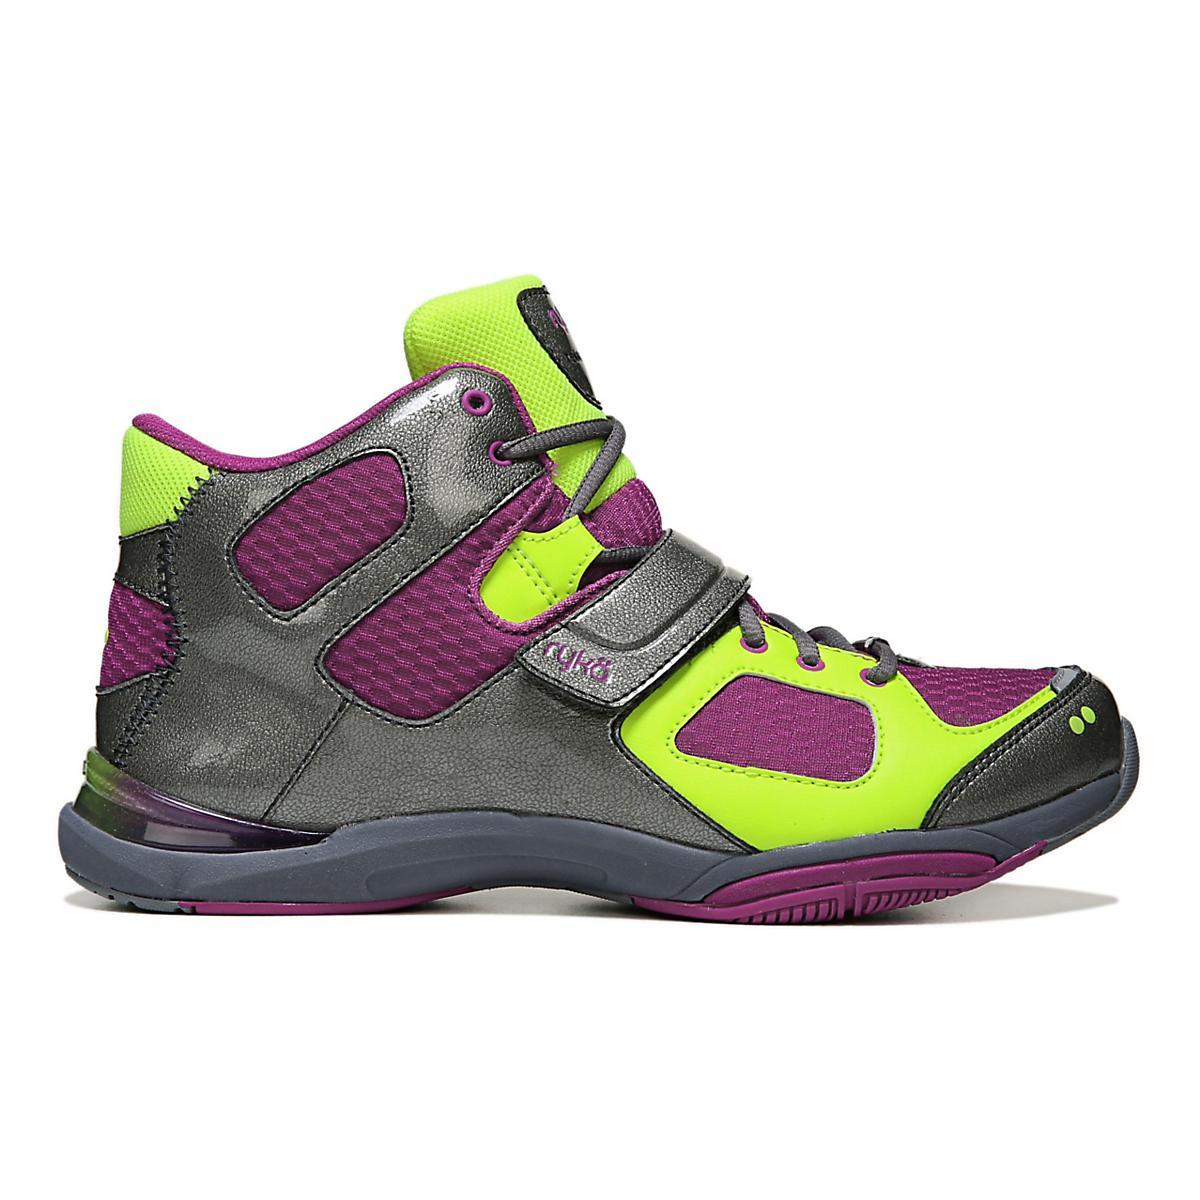 Womens Ryka Tenacious Cross Training Shoe at Road Runner ...